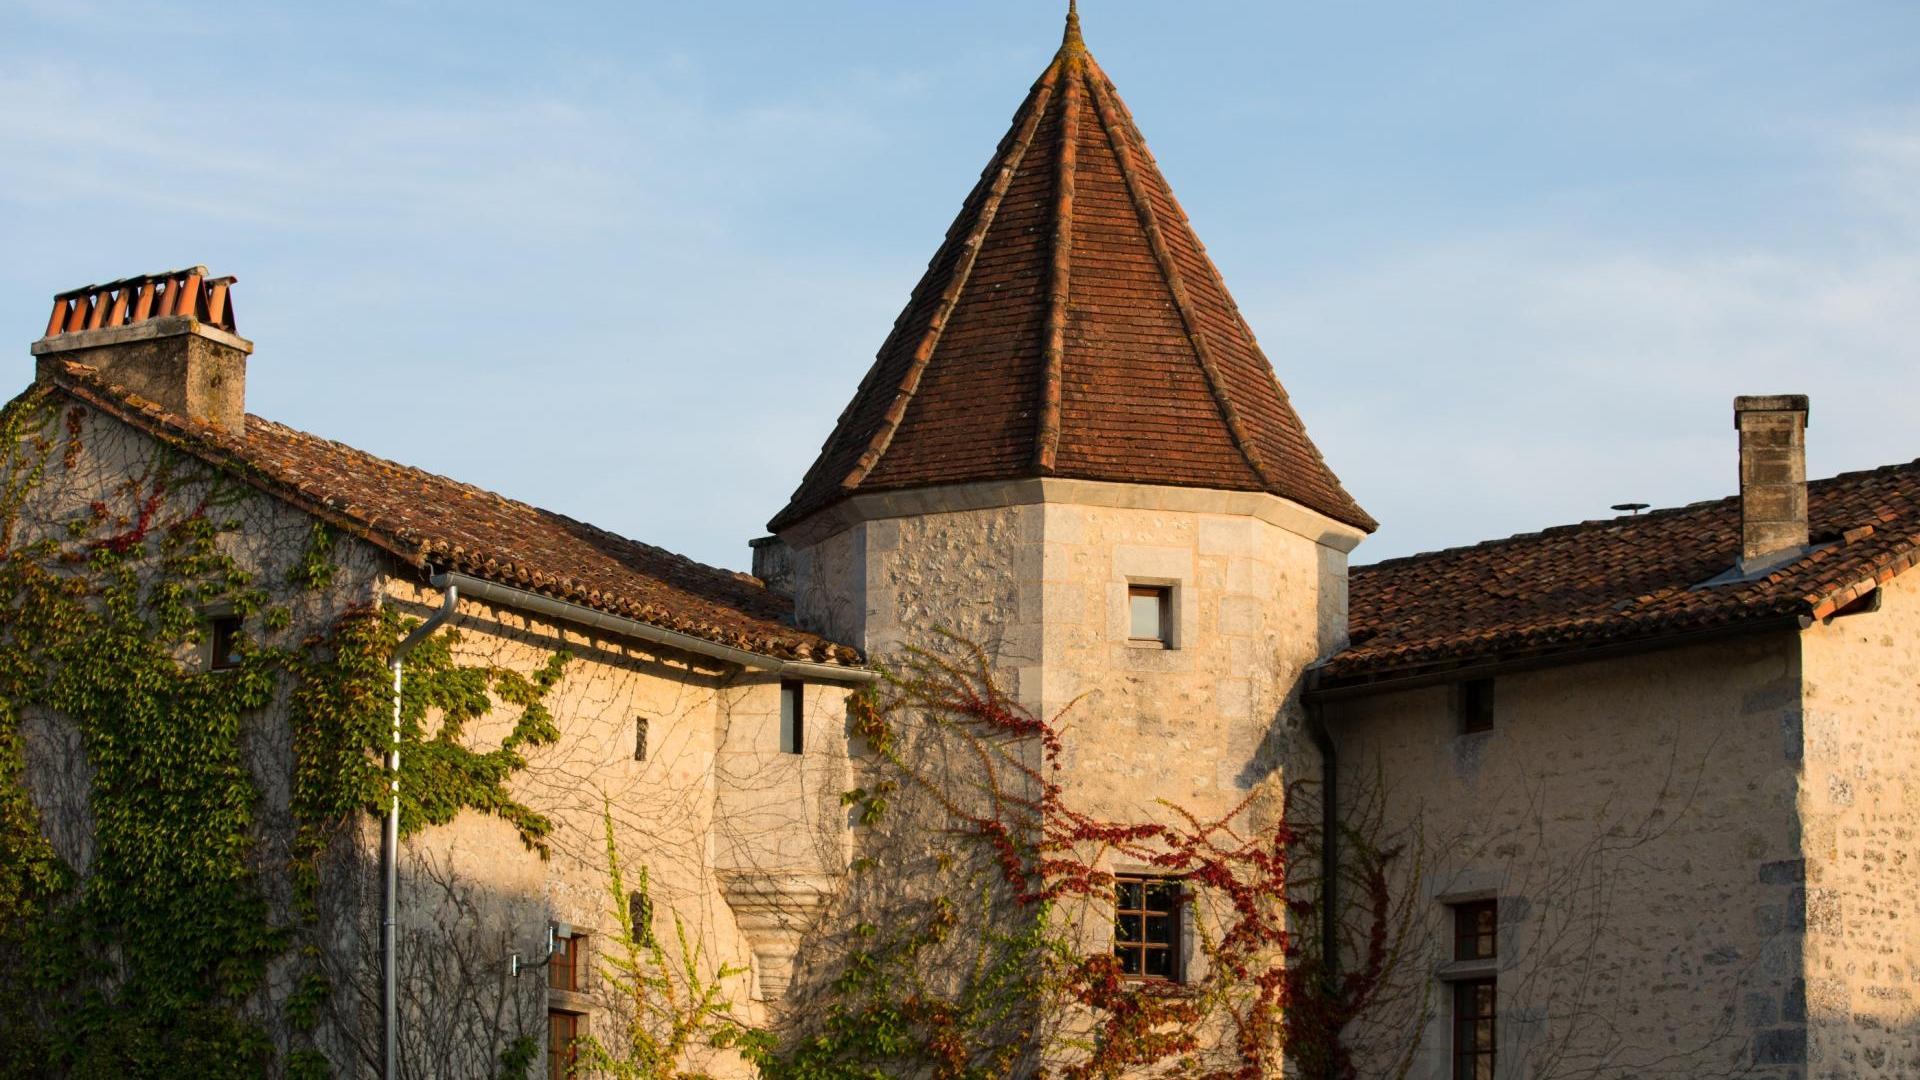 3 bedroom kid friendly cottage at Chateau de Gurat